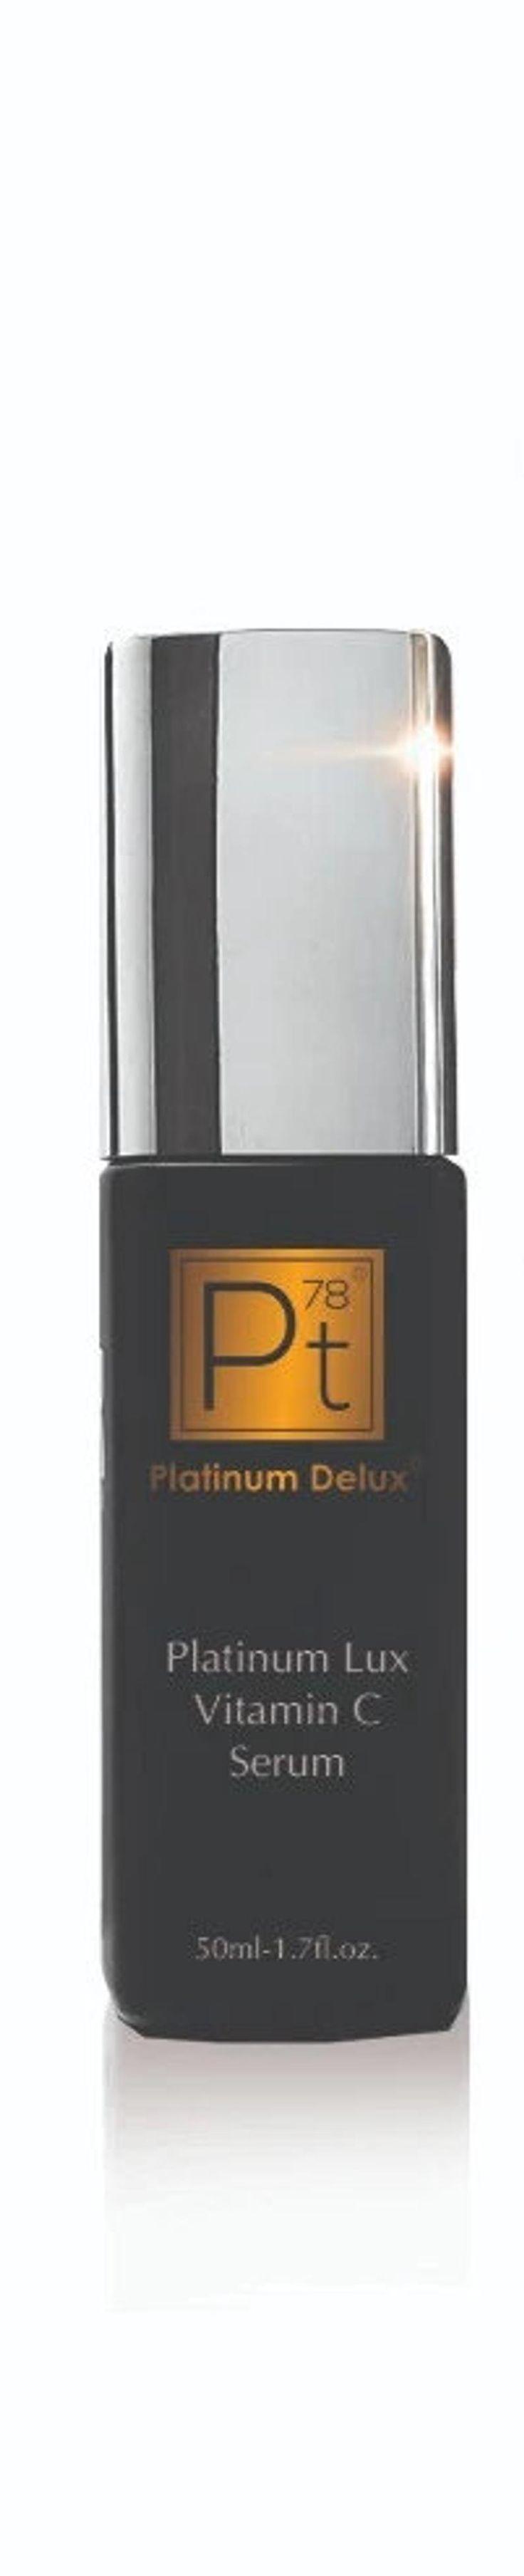 Platinum Lux Vitamin C Serum Platinum Deluxe ® | Etsy Platinum Skin Care, Colloidal Gold, Vitamin C Cream, Even Out Skin Tone, Smooth Lines, Skin Brightening, Active Ingredient, Collagen